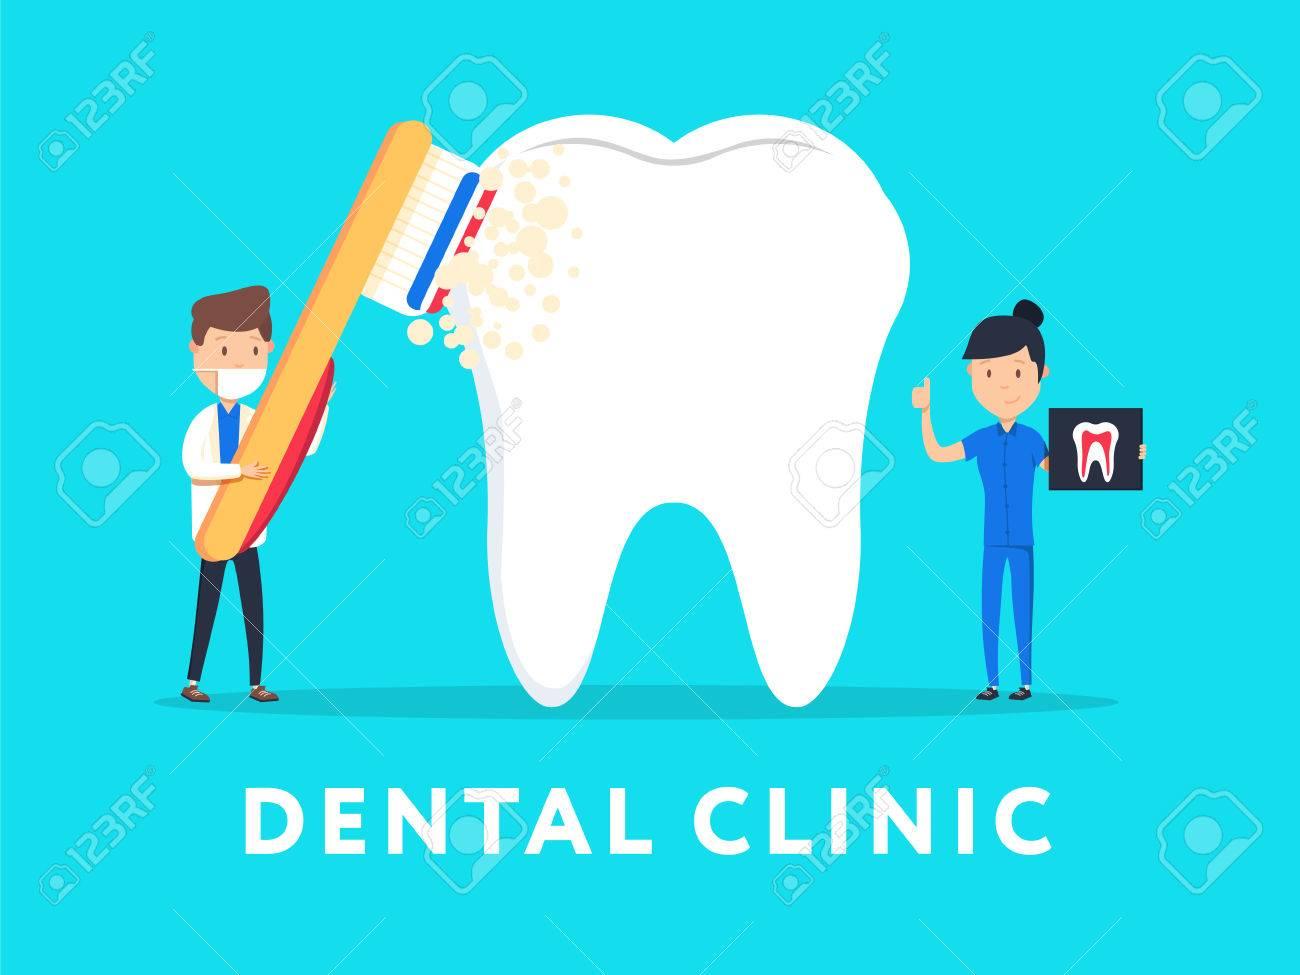 81035064-dental-clinic-concept-design-fo